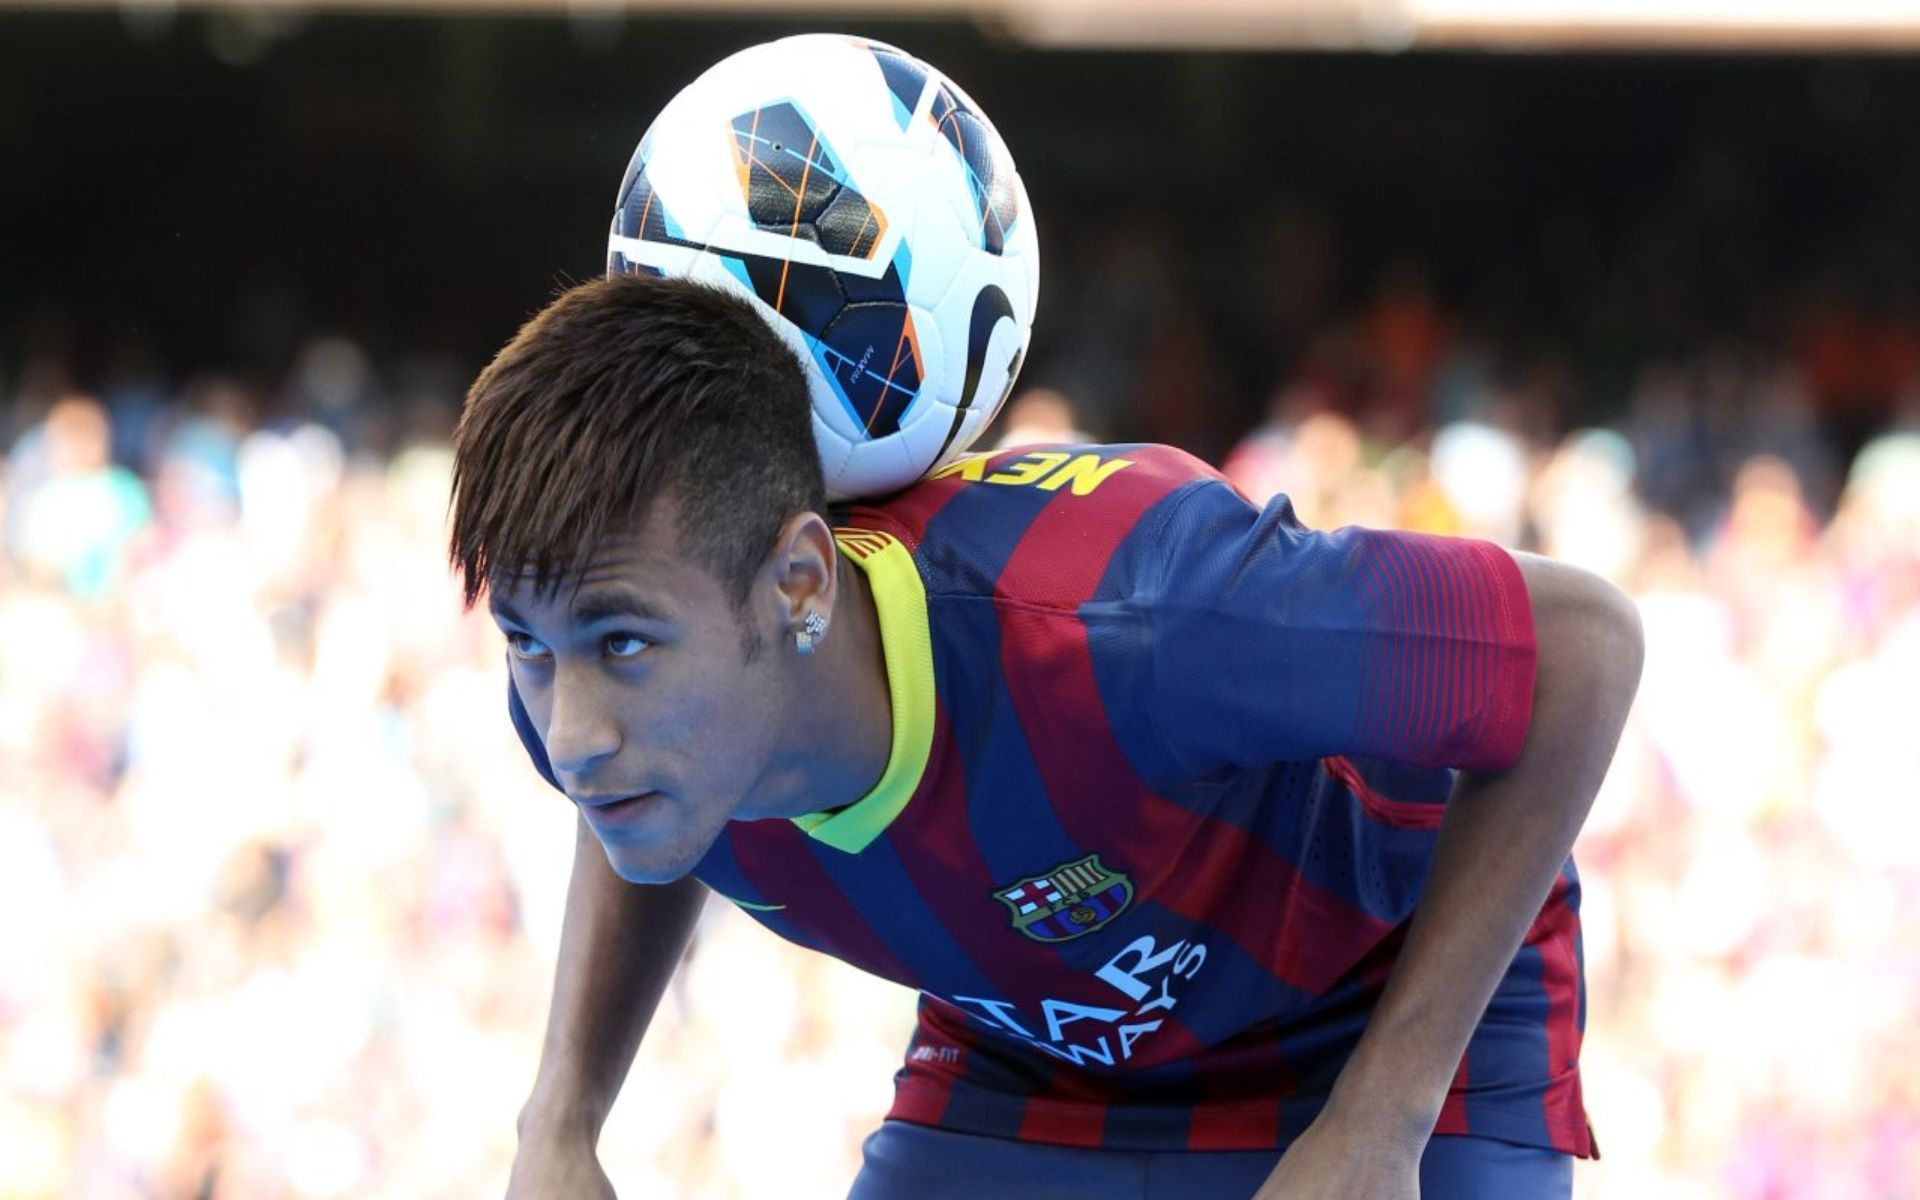 Download wallpaper Neymar Barcelona, Neymar Presentation, Ne